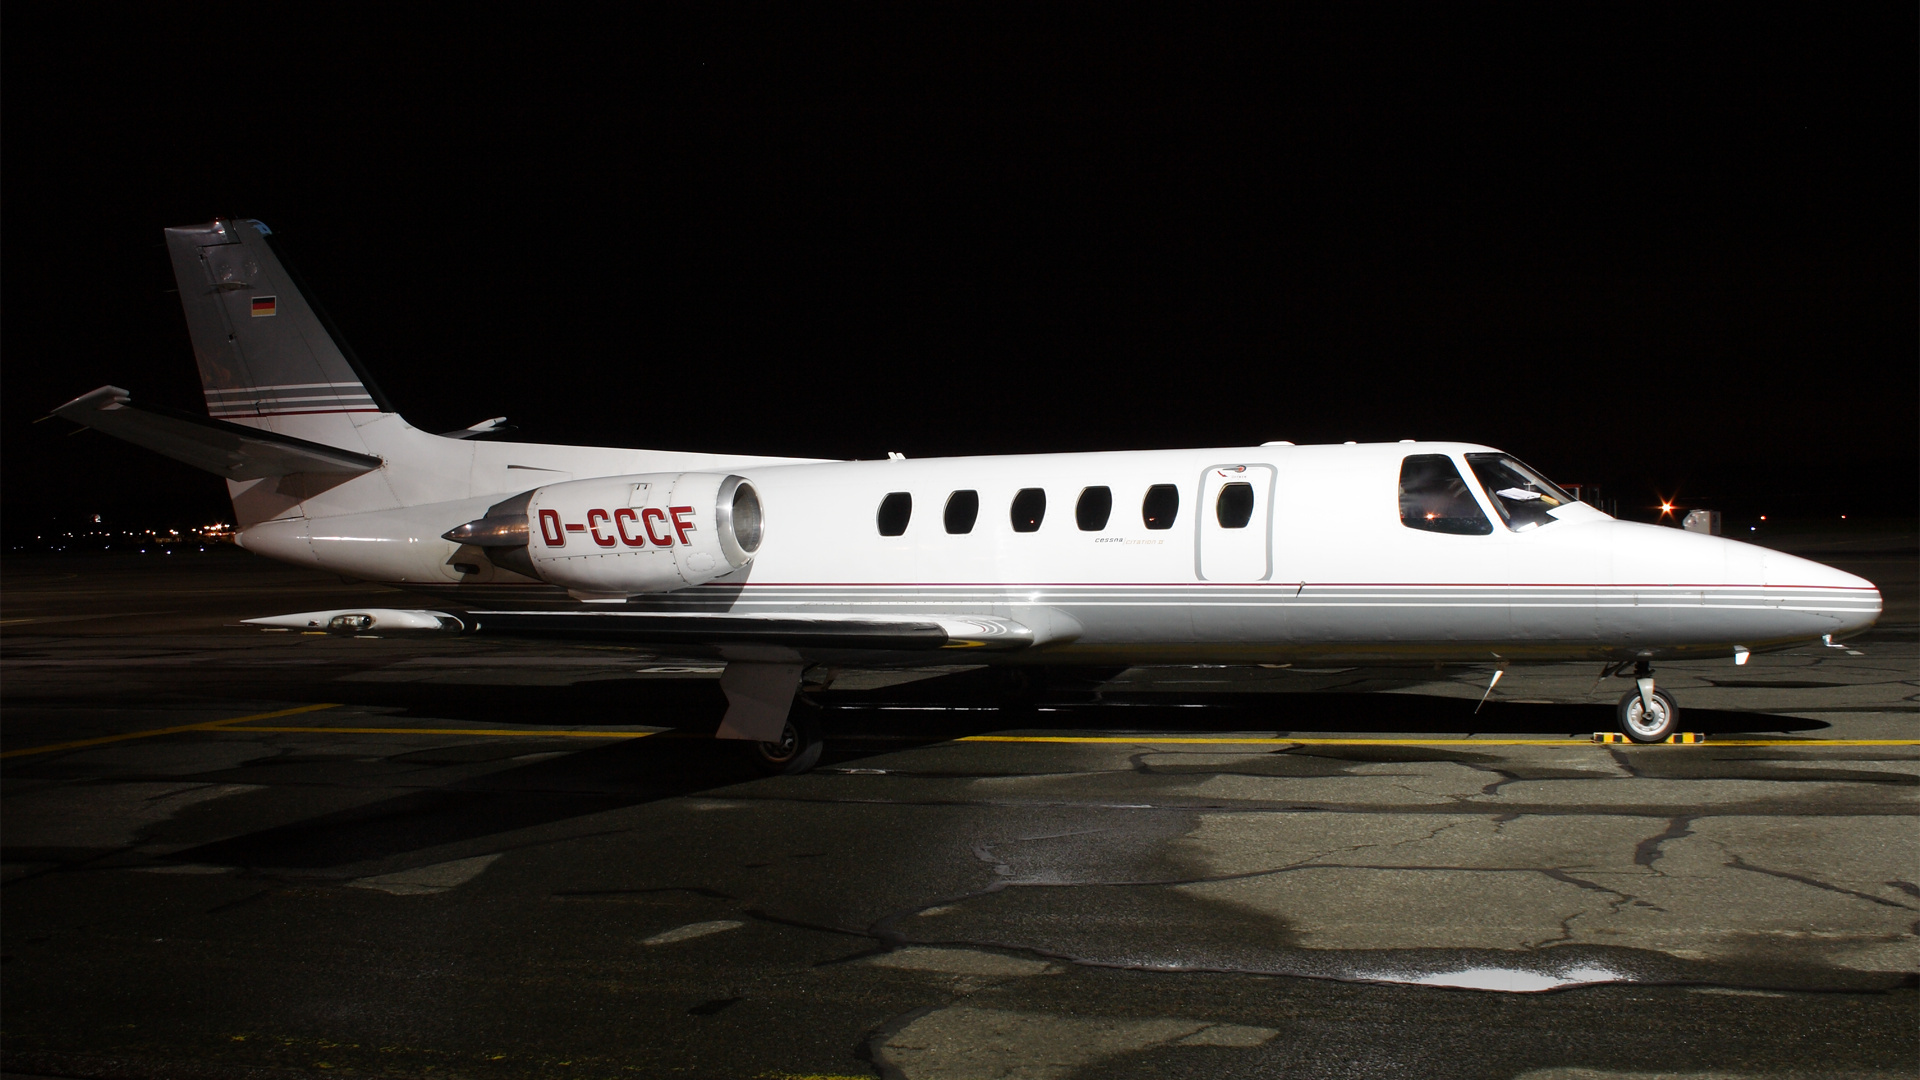 D-CCCF-2 C550 ESS 200801